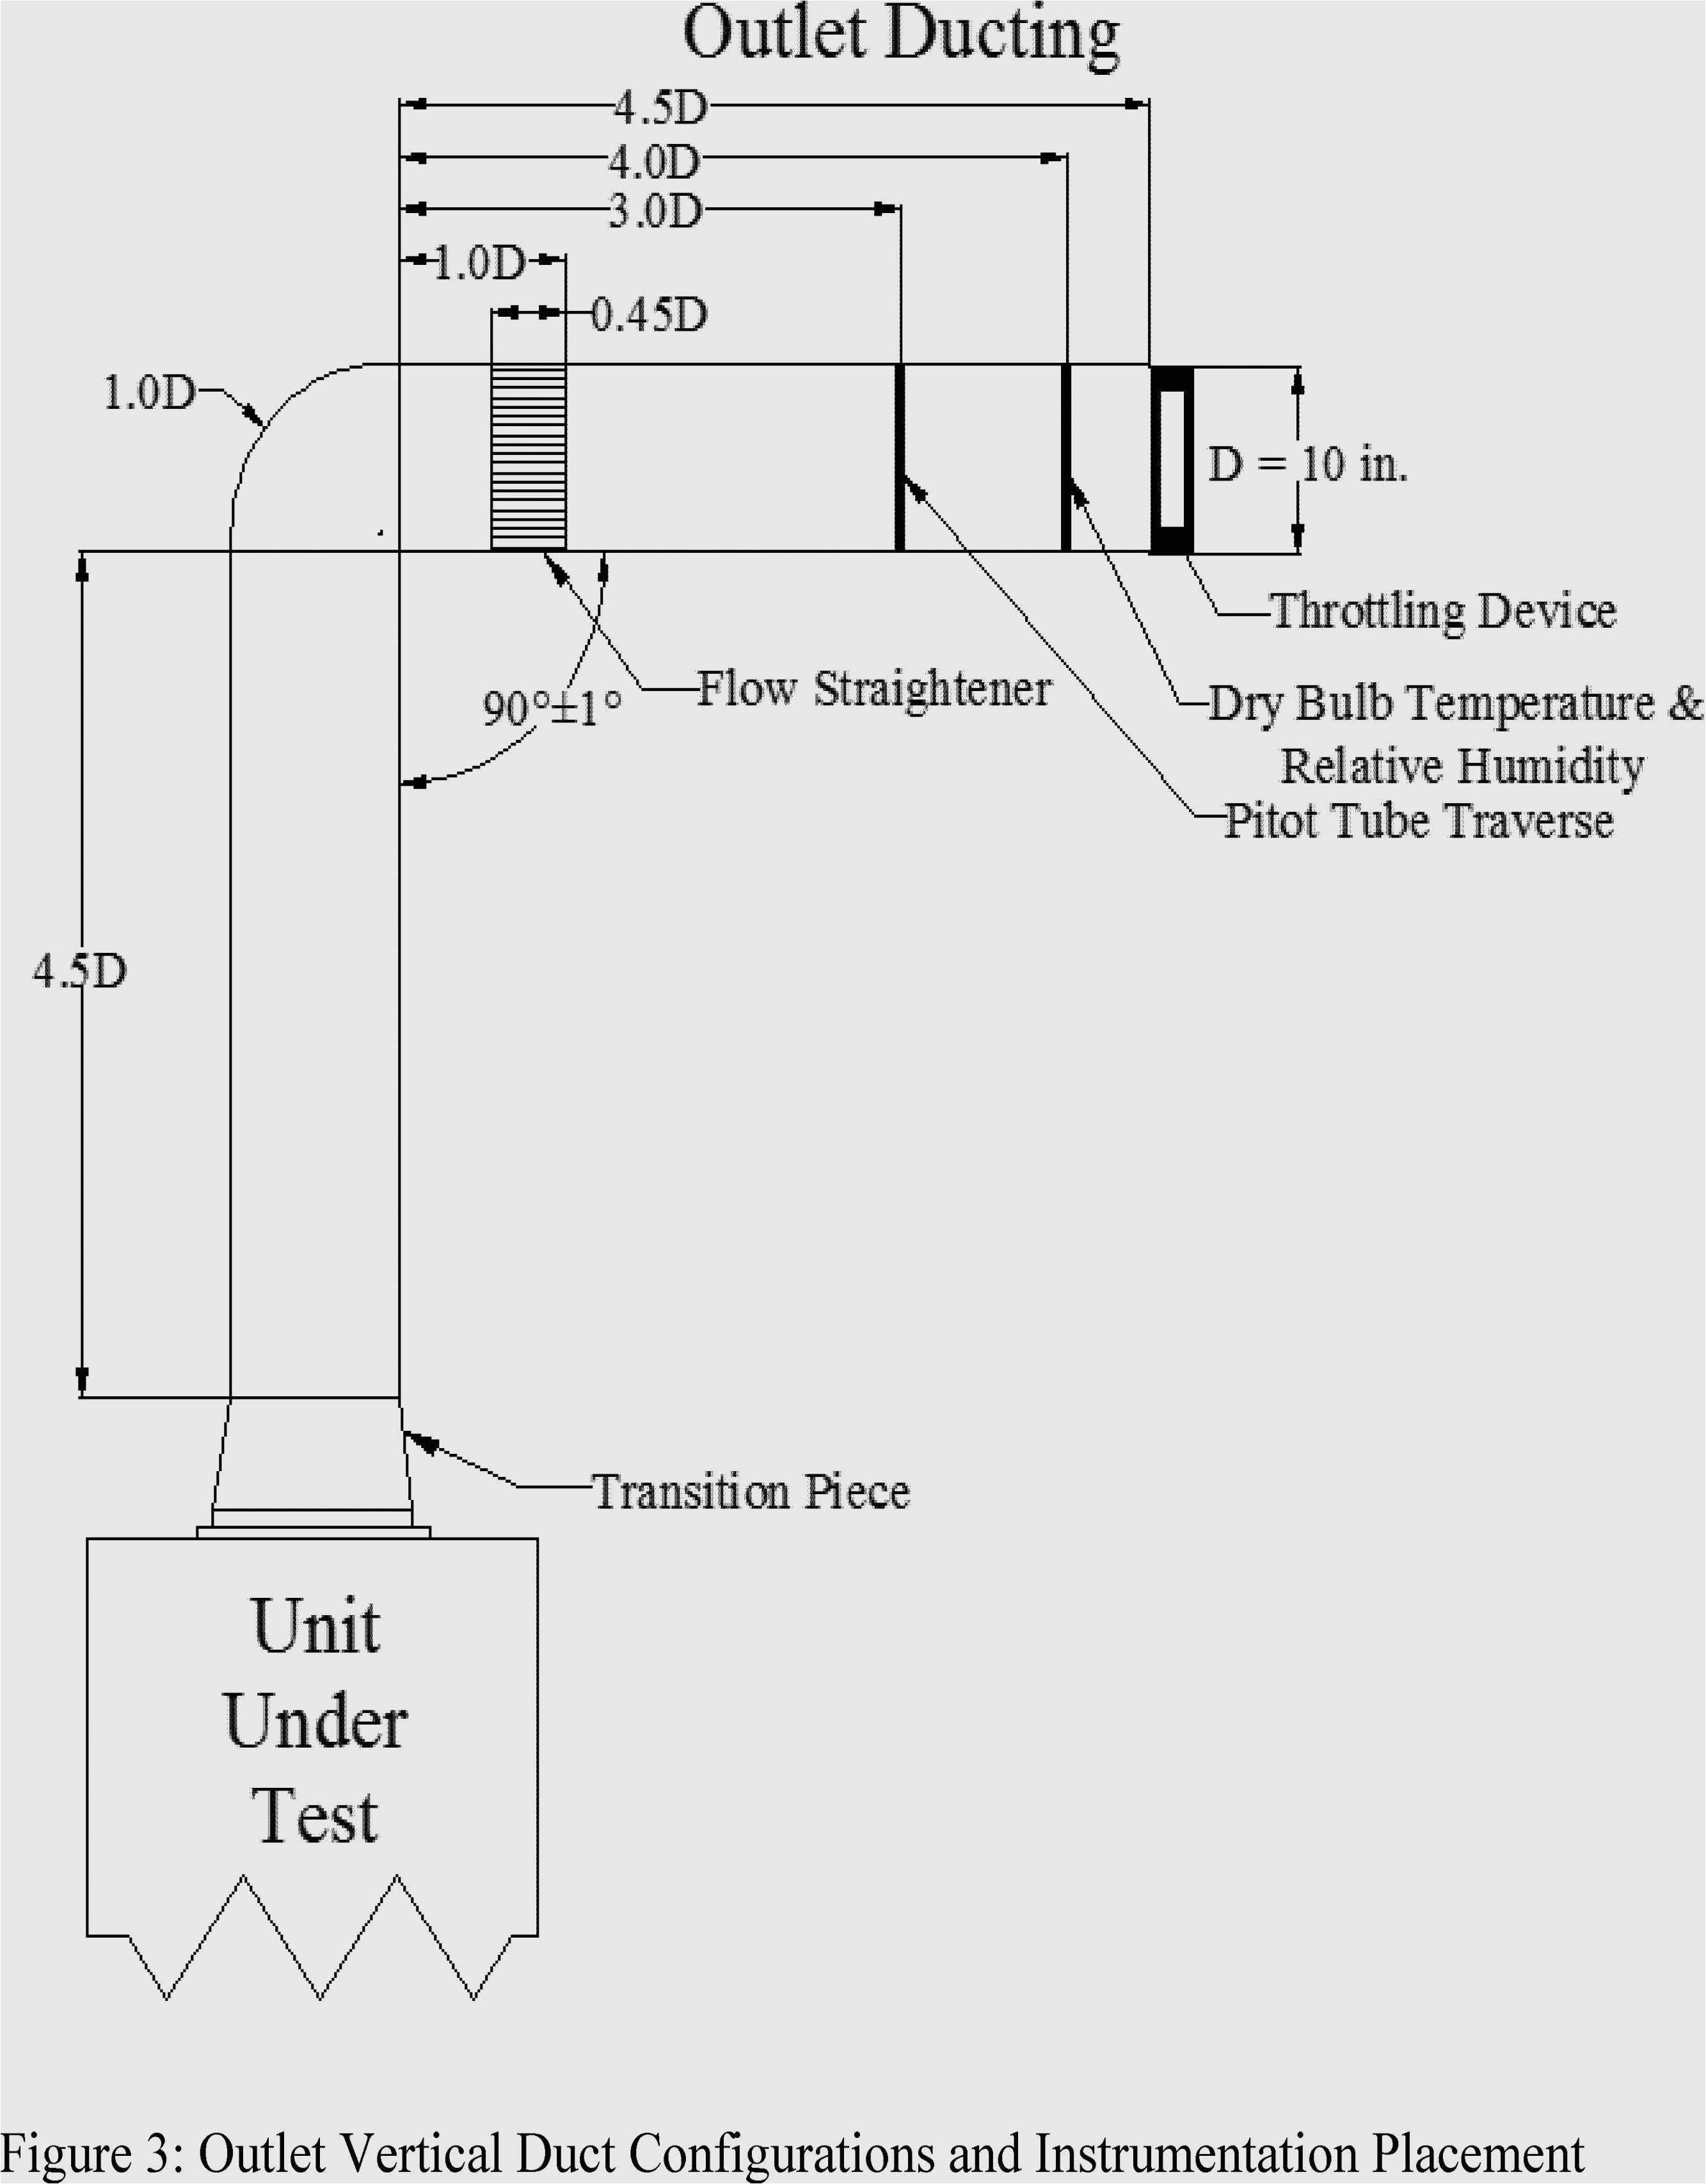 Light Switch Wiring Diagram 3 Way Wiring Diagram 3 Way Switch Inspirational 3 Way Switch Wiring